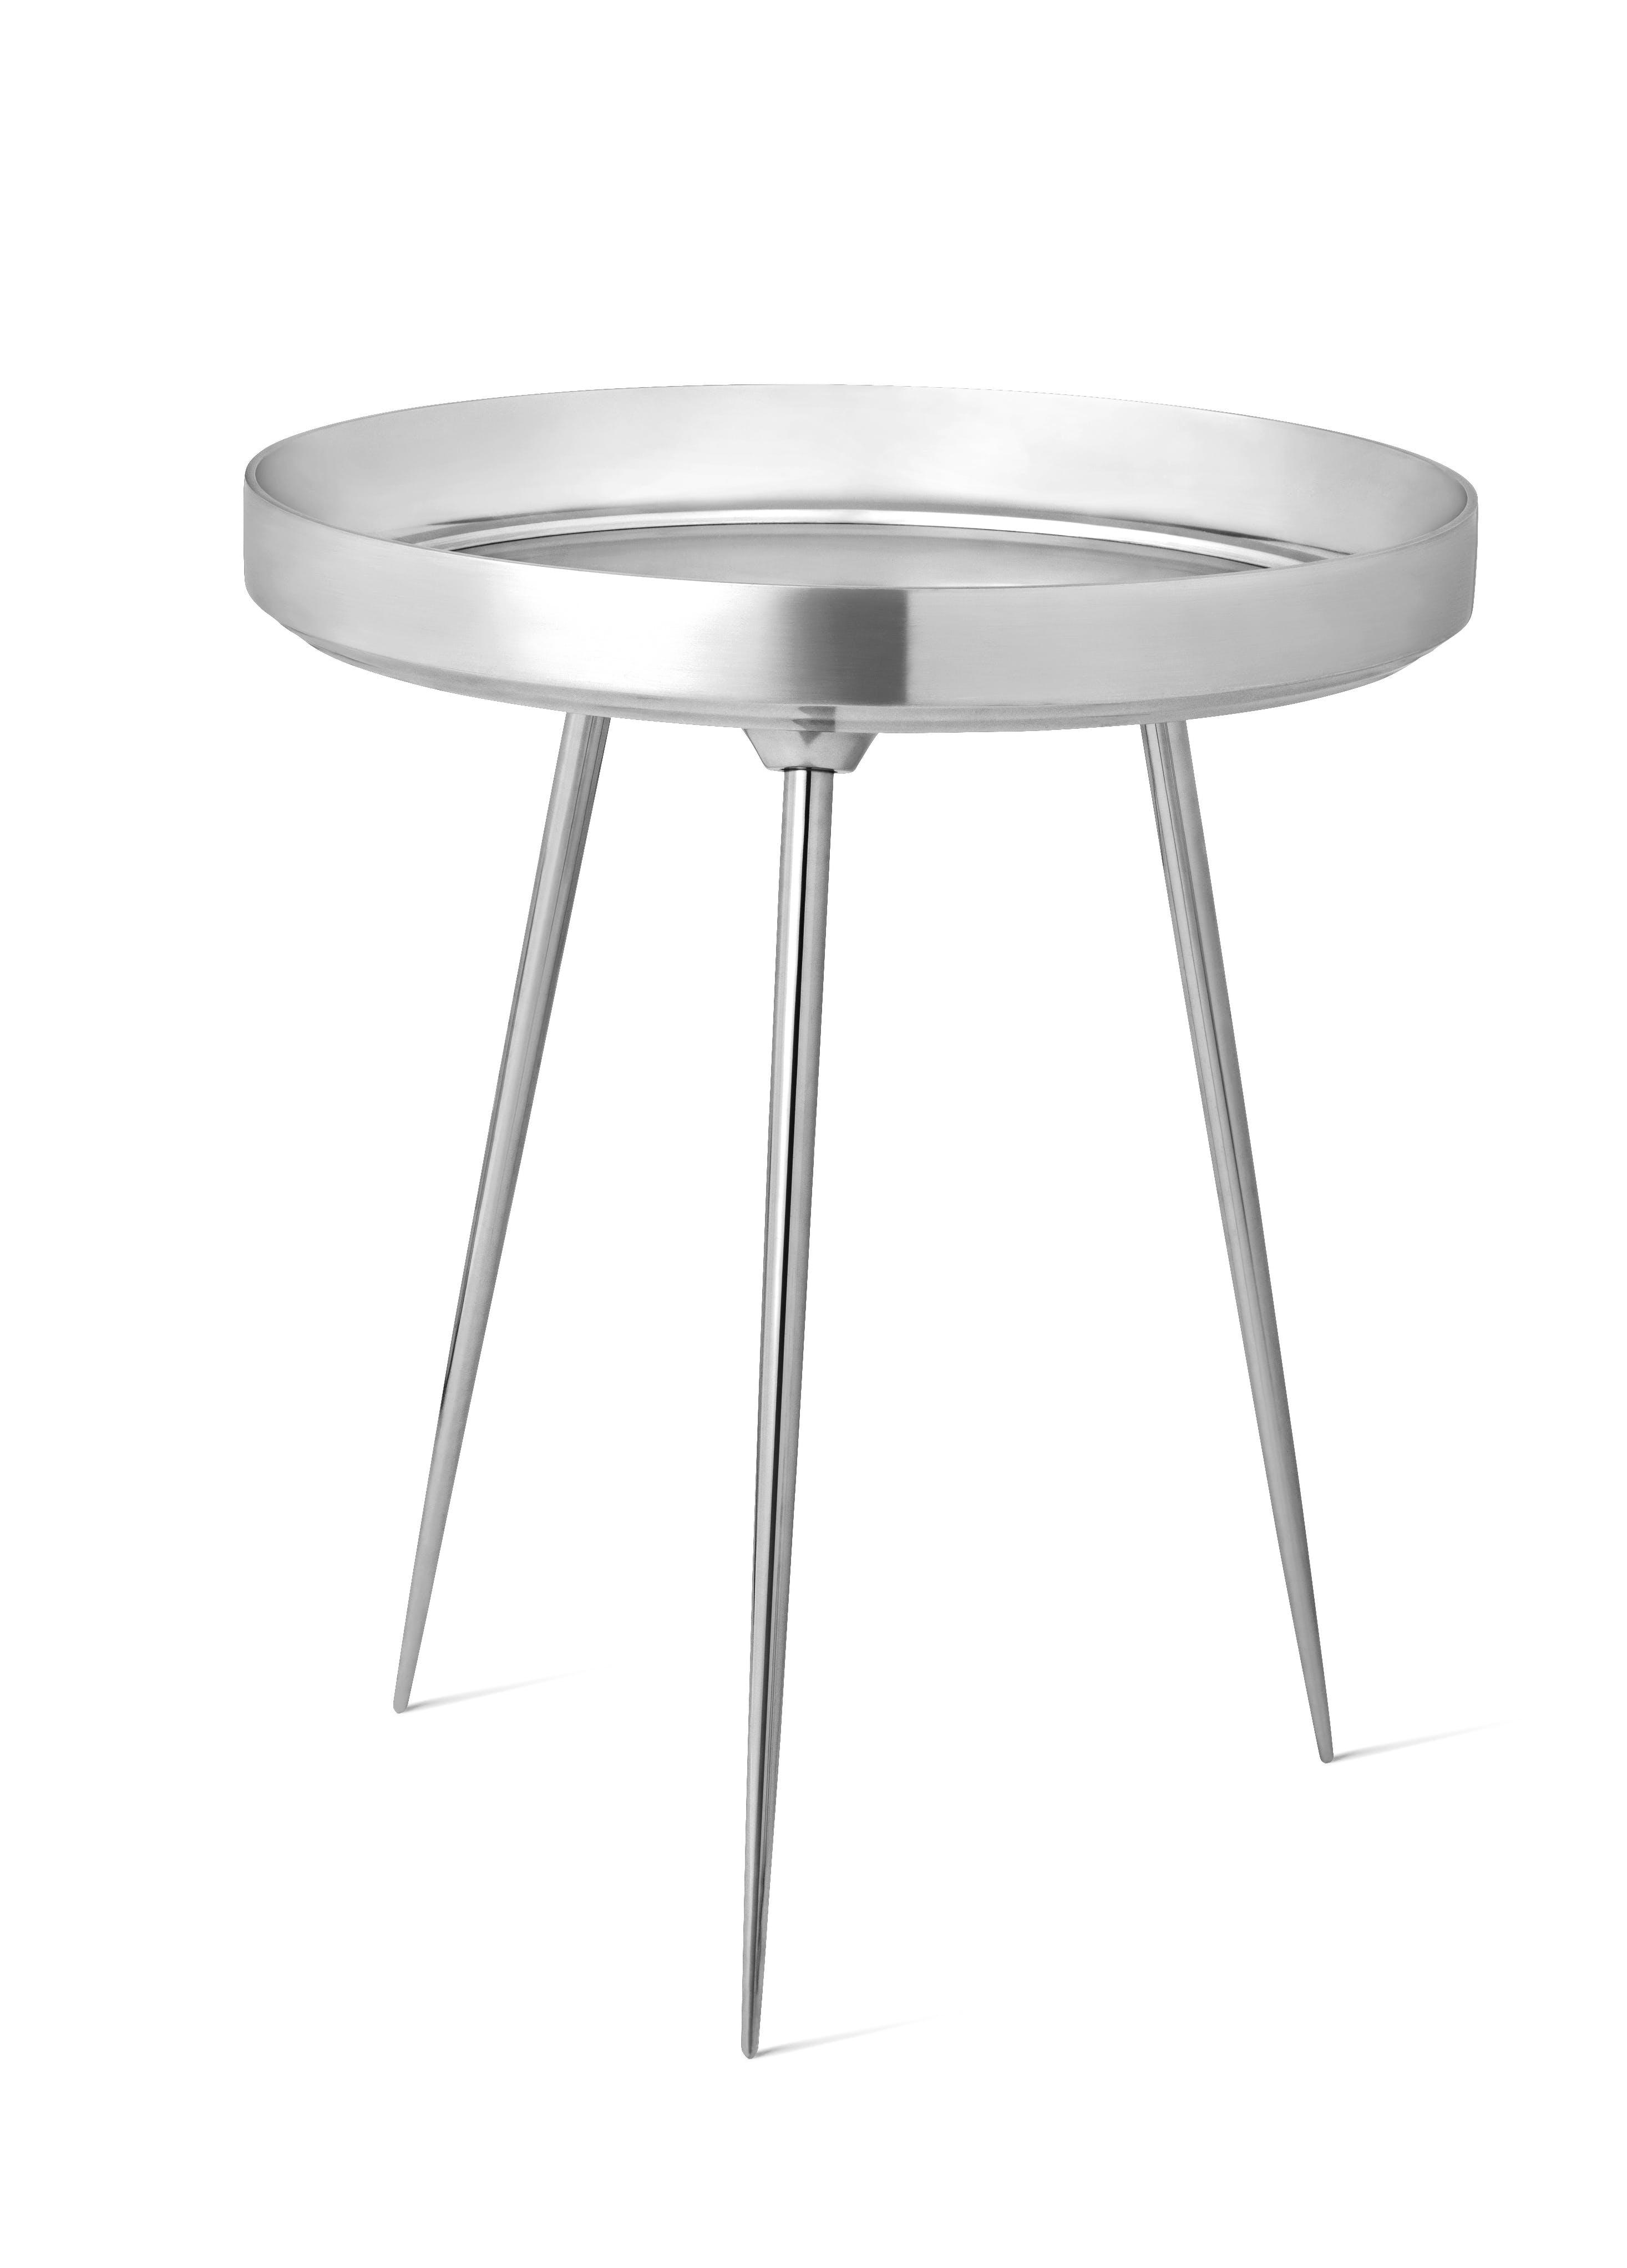 Mater Polished Aluminum Bowl Table Haute Living